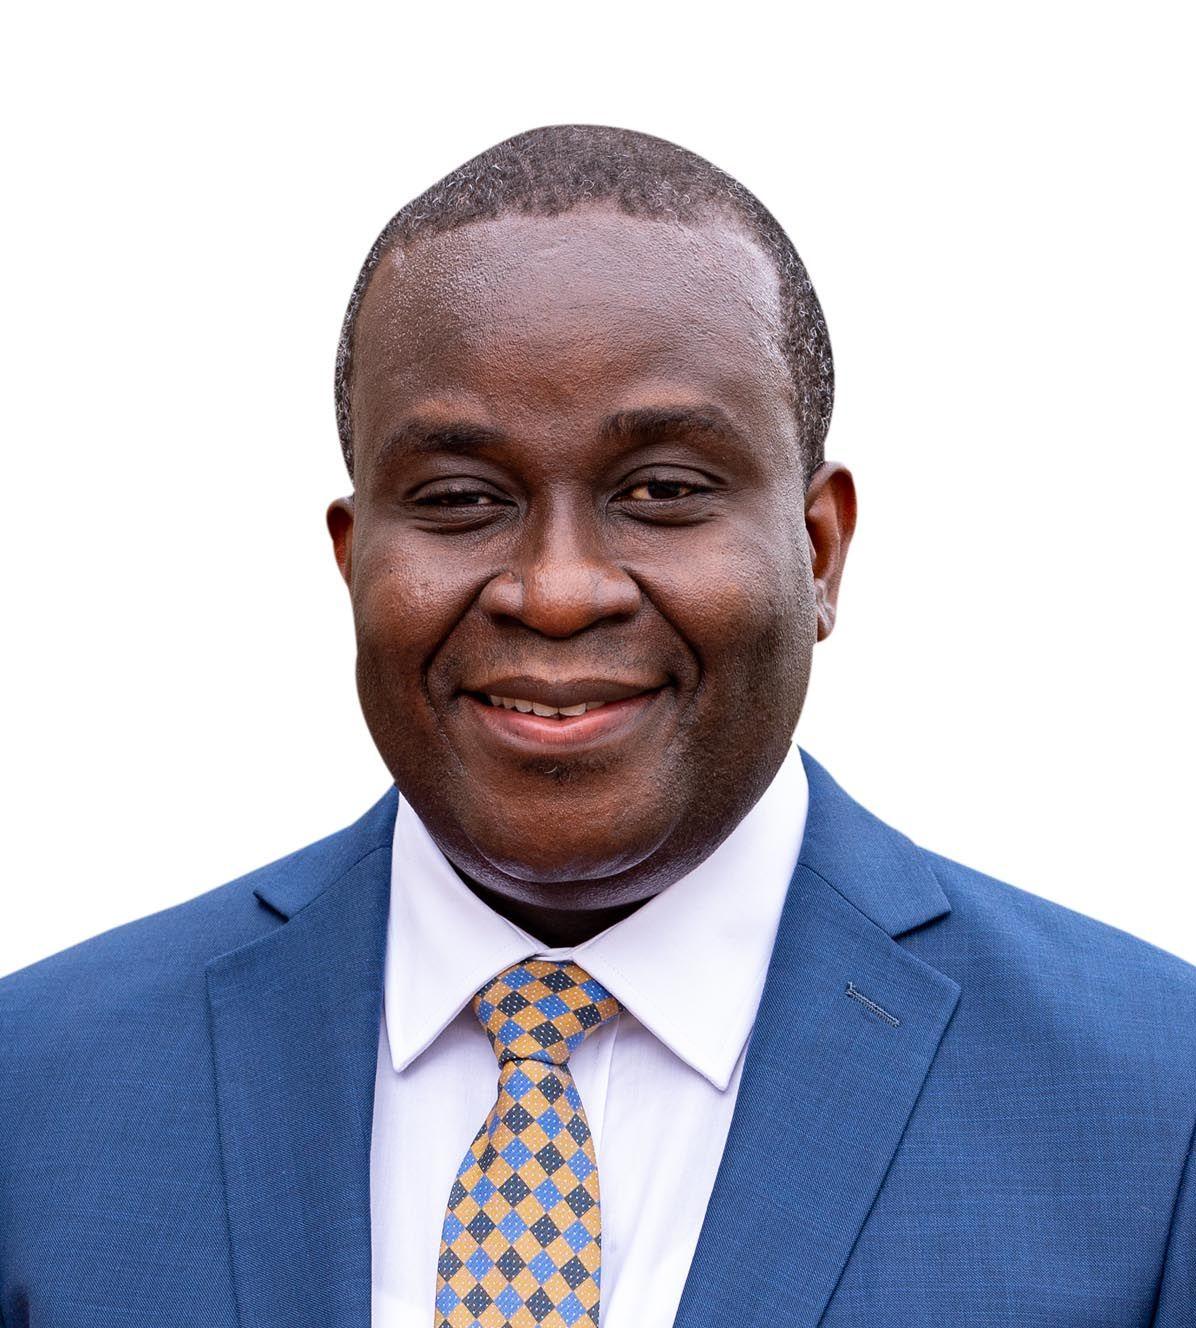 Aps Emmanuel Agyemang Bekoe